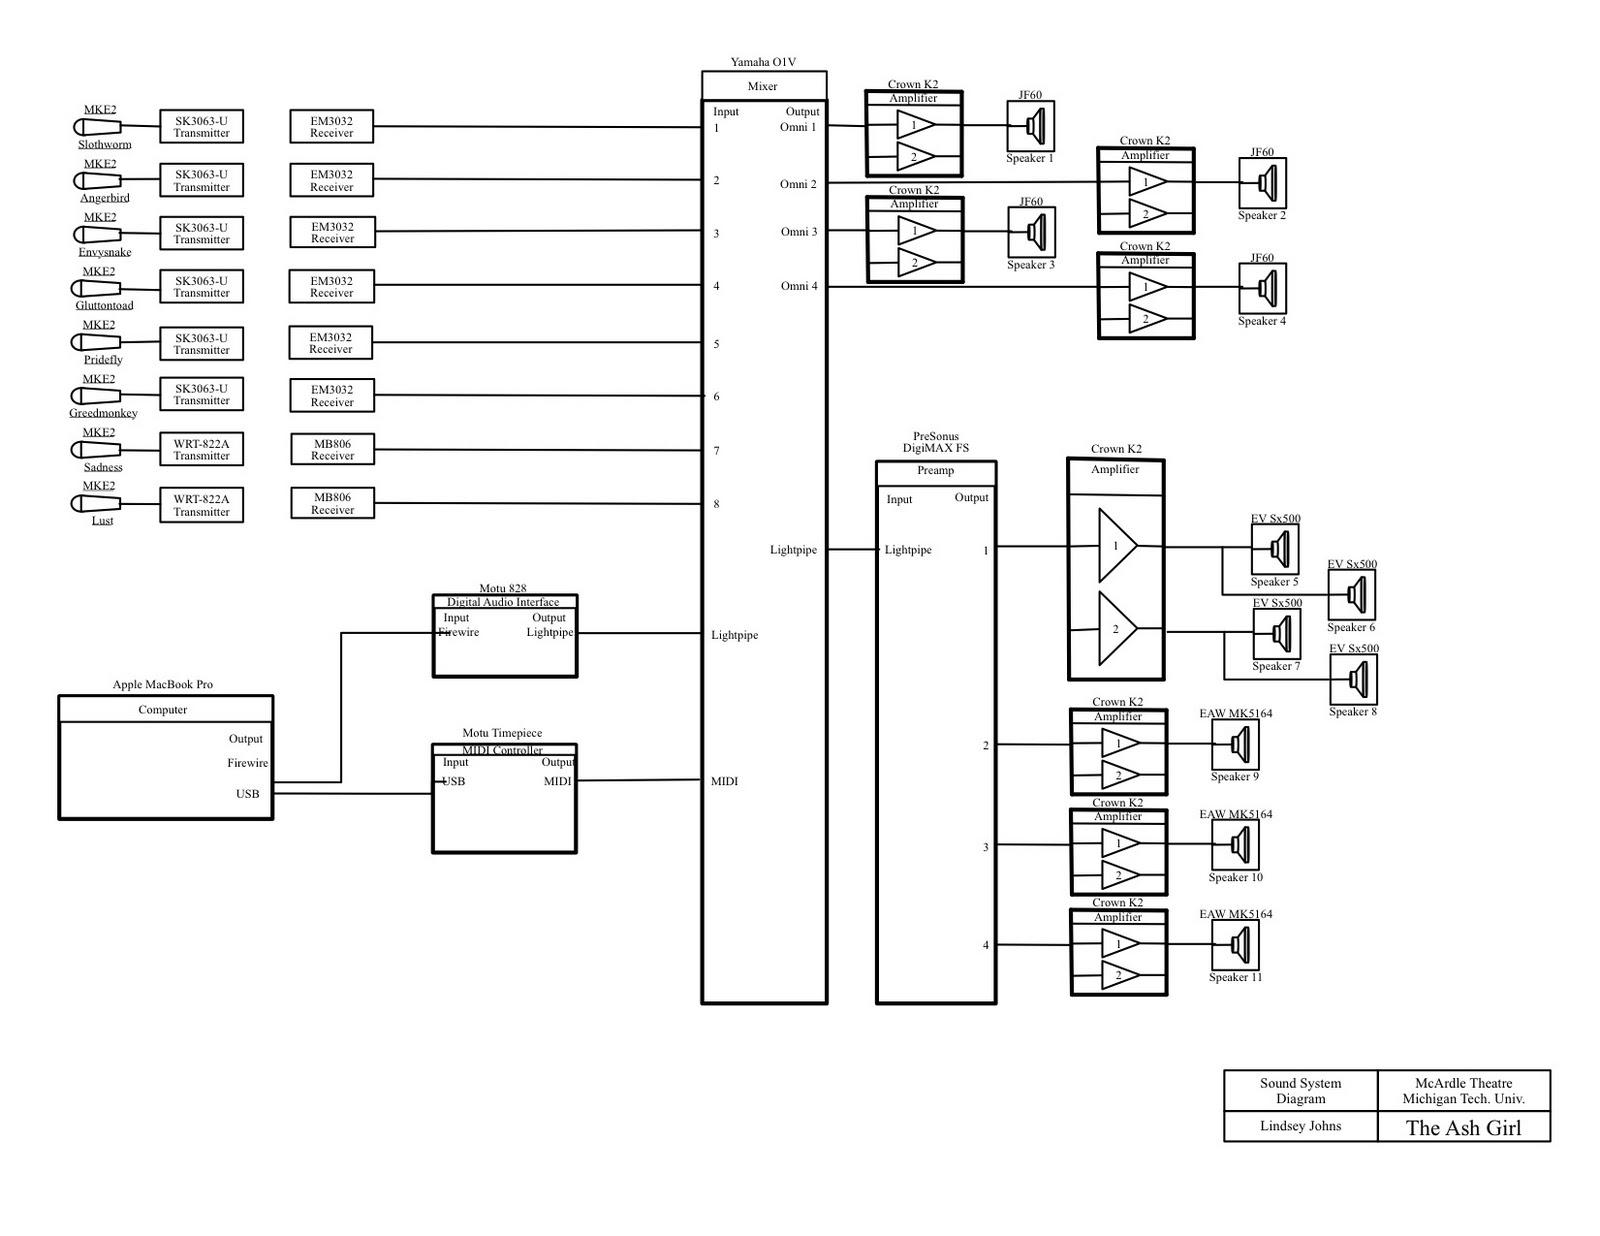 Live Band Setup Diagram Sound Wiring Lindsey L Johns The Ash Girl And System Design